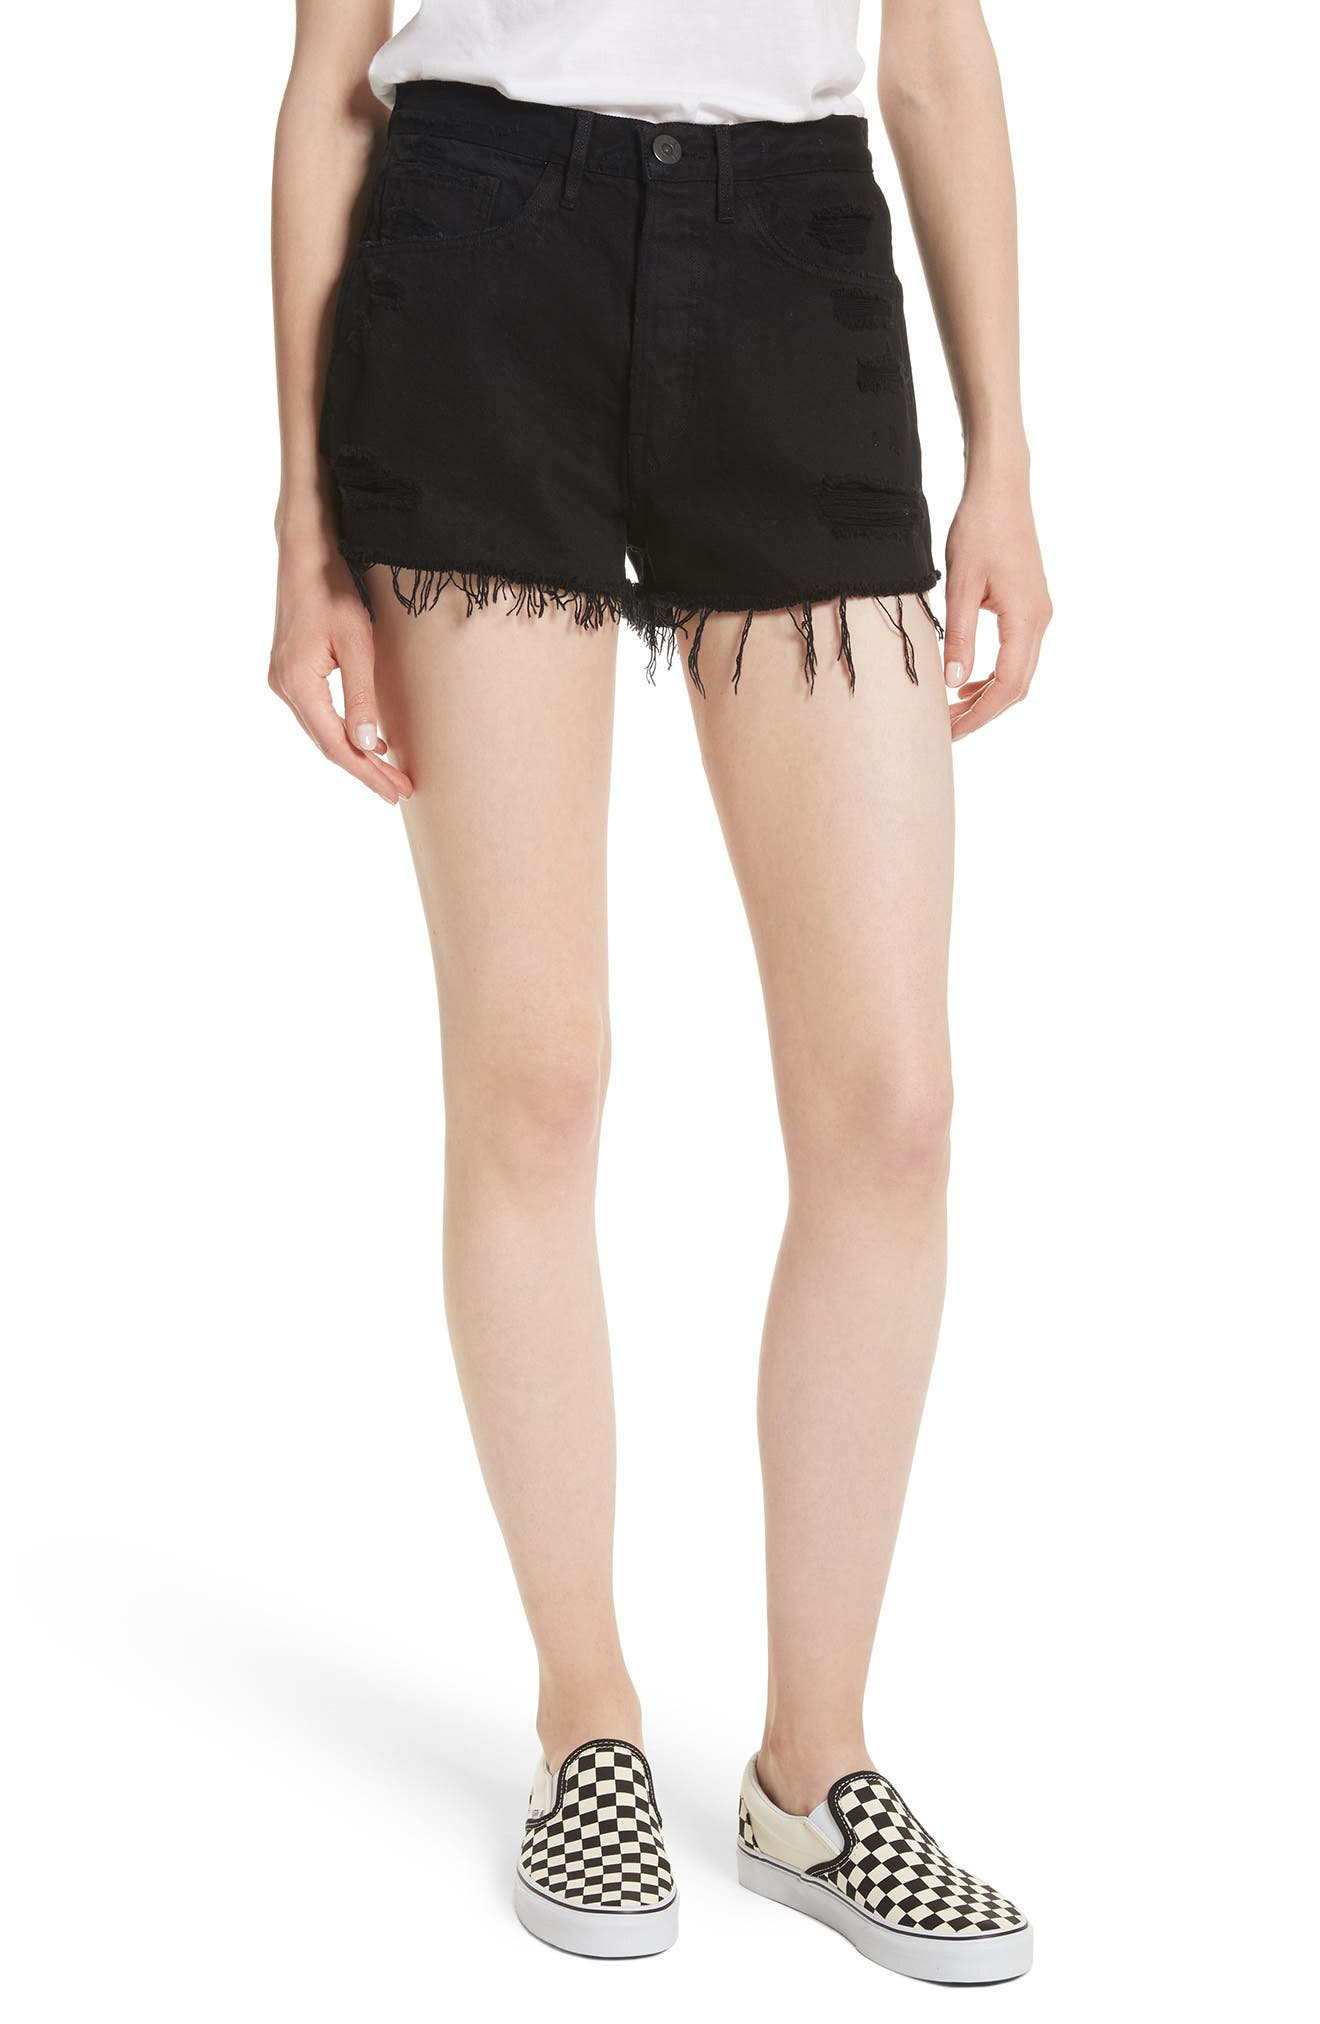 3x1 NYC W4 Carter Ripped High Waist Denim Shorts (Carbon)